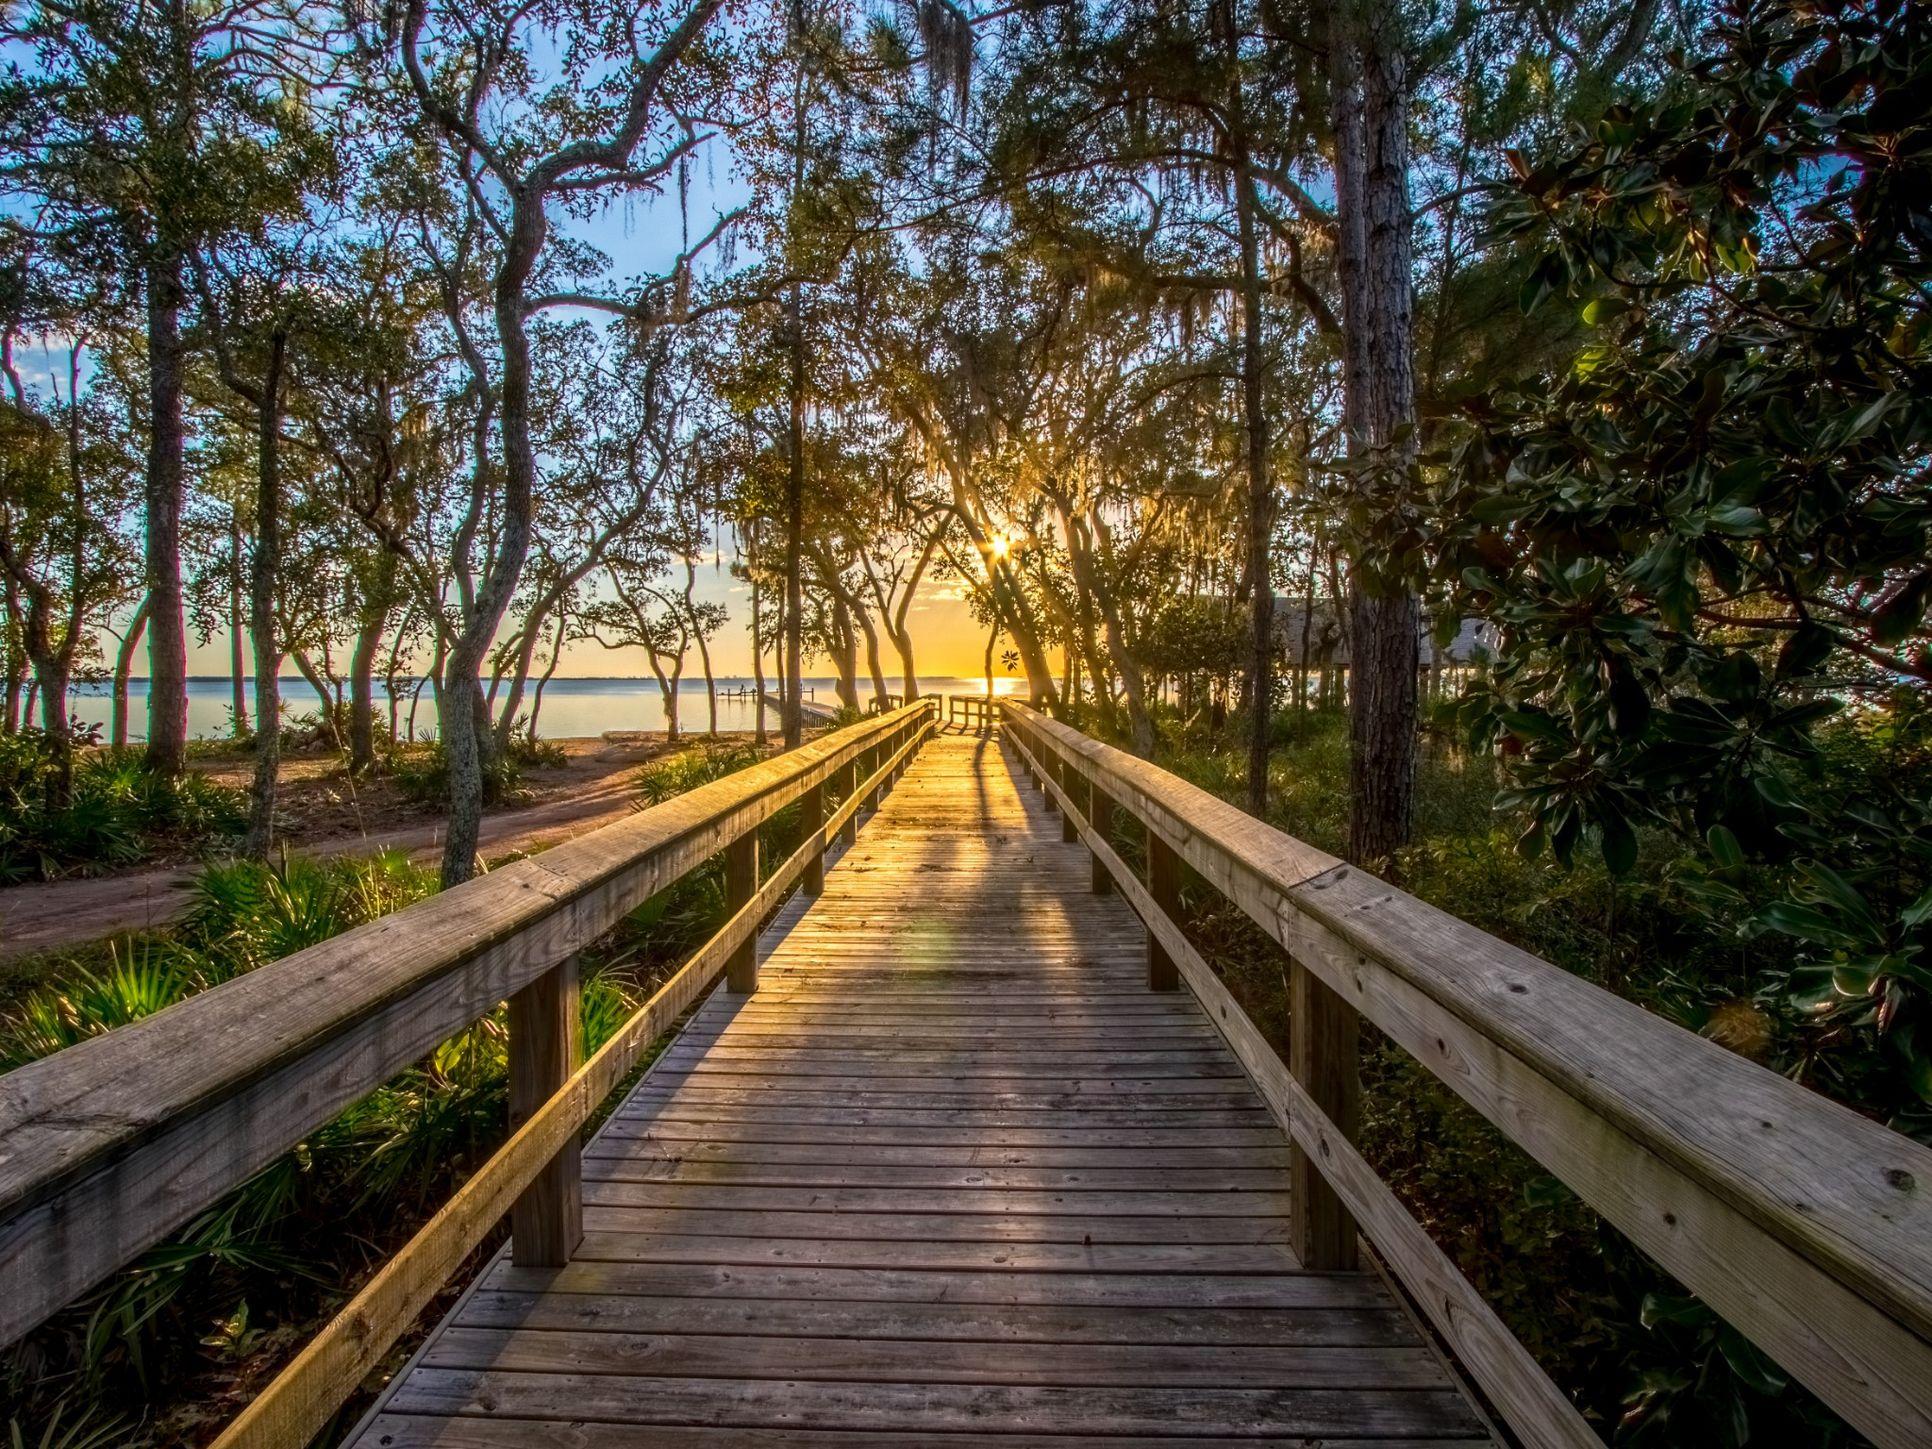 The Trails at Hammock Bay Walking Trail